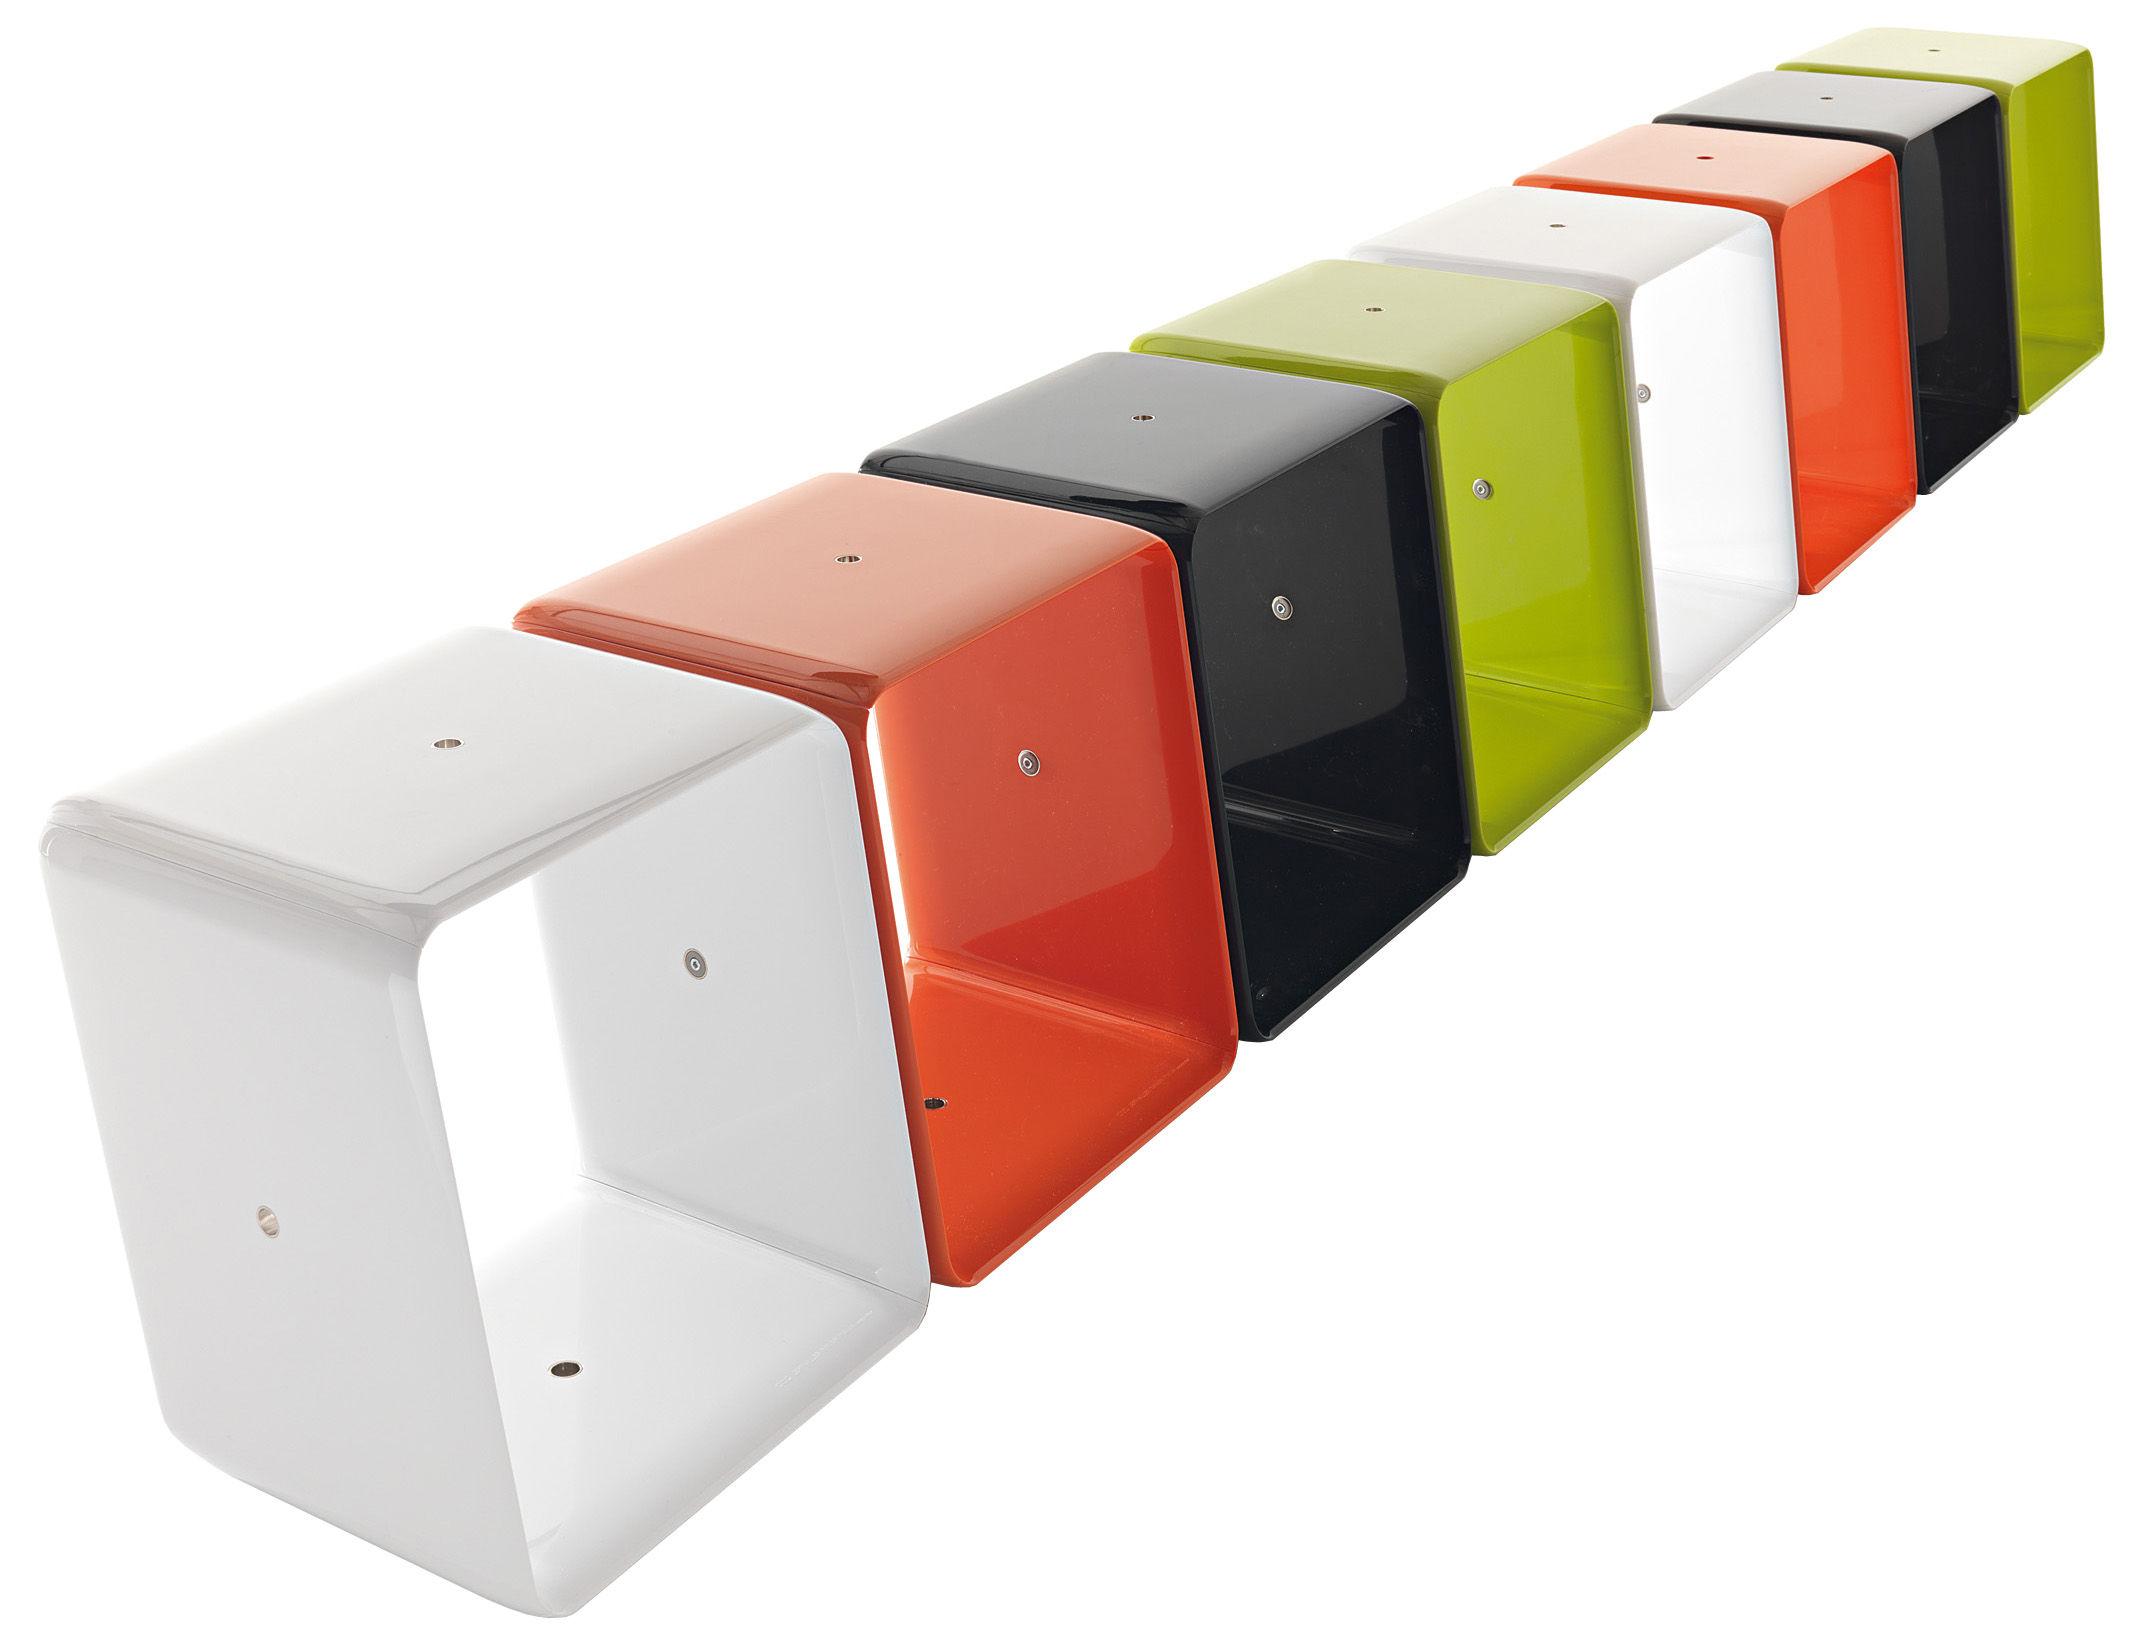 Etag re obo cube modulaire orange cerruti baleri - Bloc etagere modulable ...